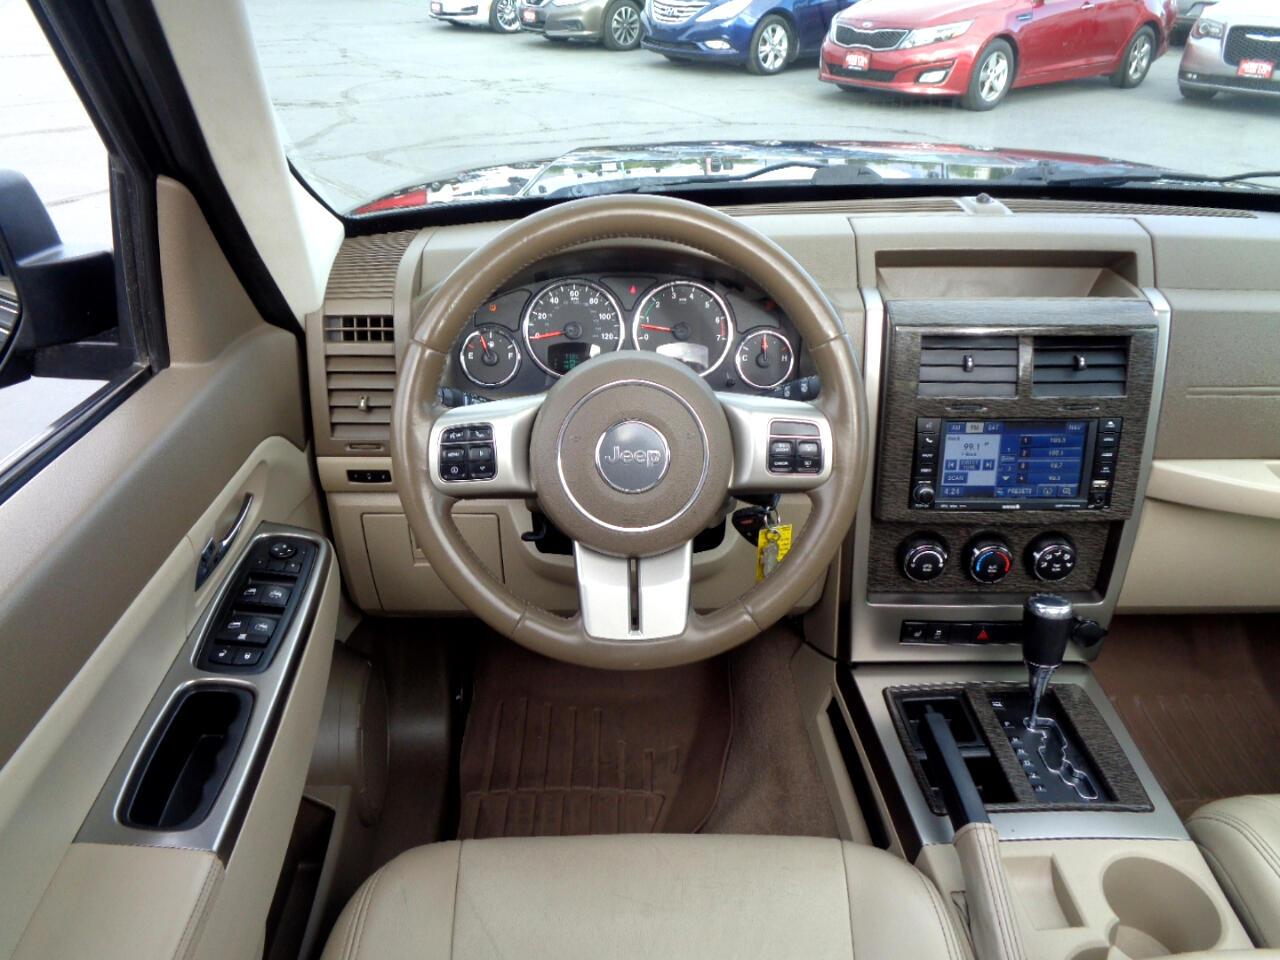 2011 Jeep Liberty RWD 4dr Limited